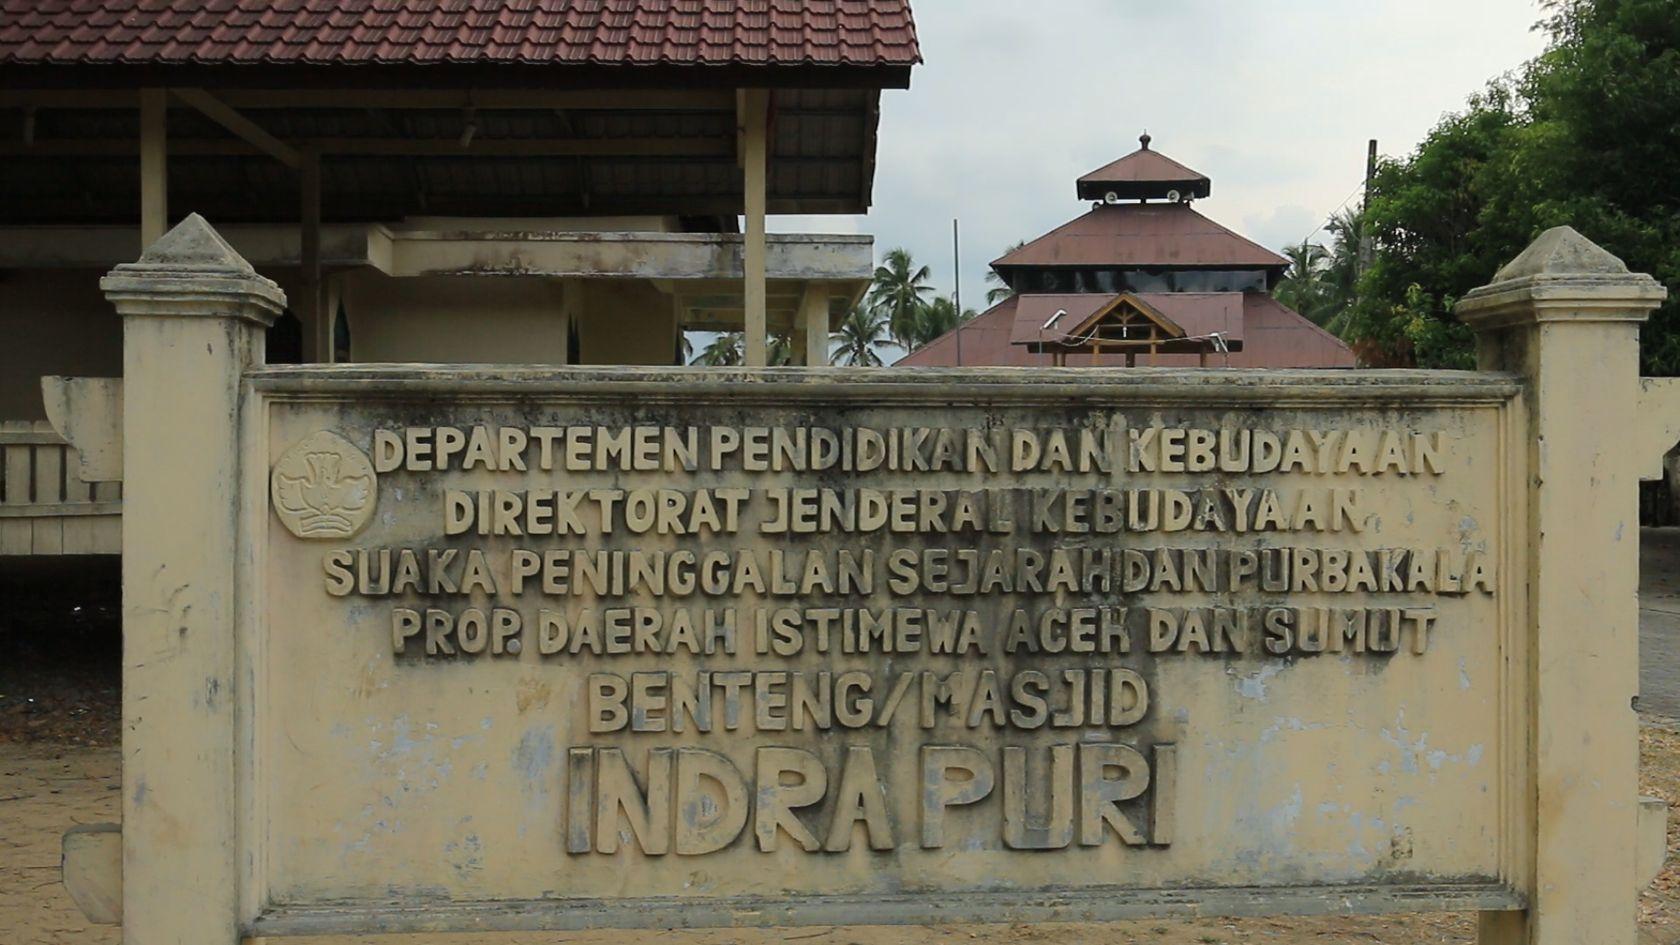 Jejak Kerajaan Hindu Aceh Kingdom Arkeolog Peneliti Melakukan Penelitian Sepanjang